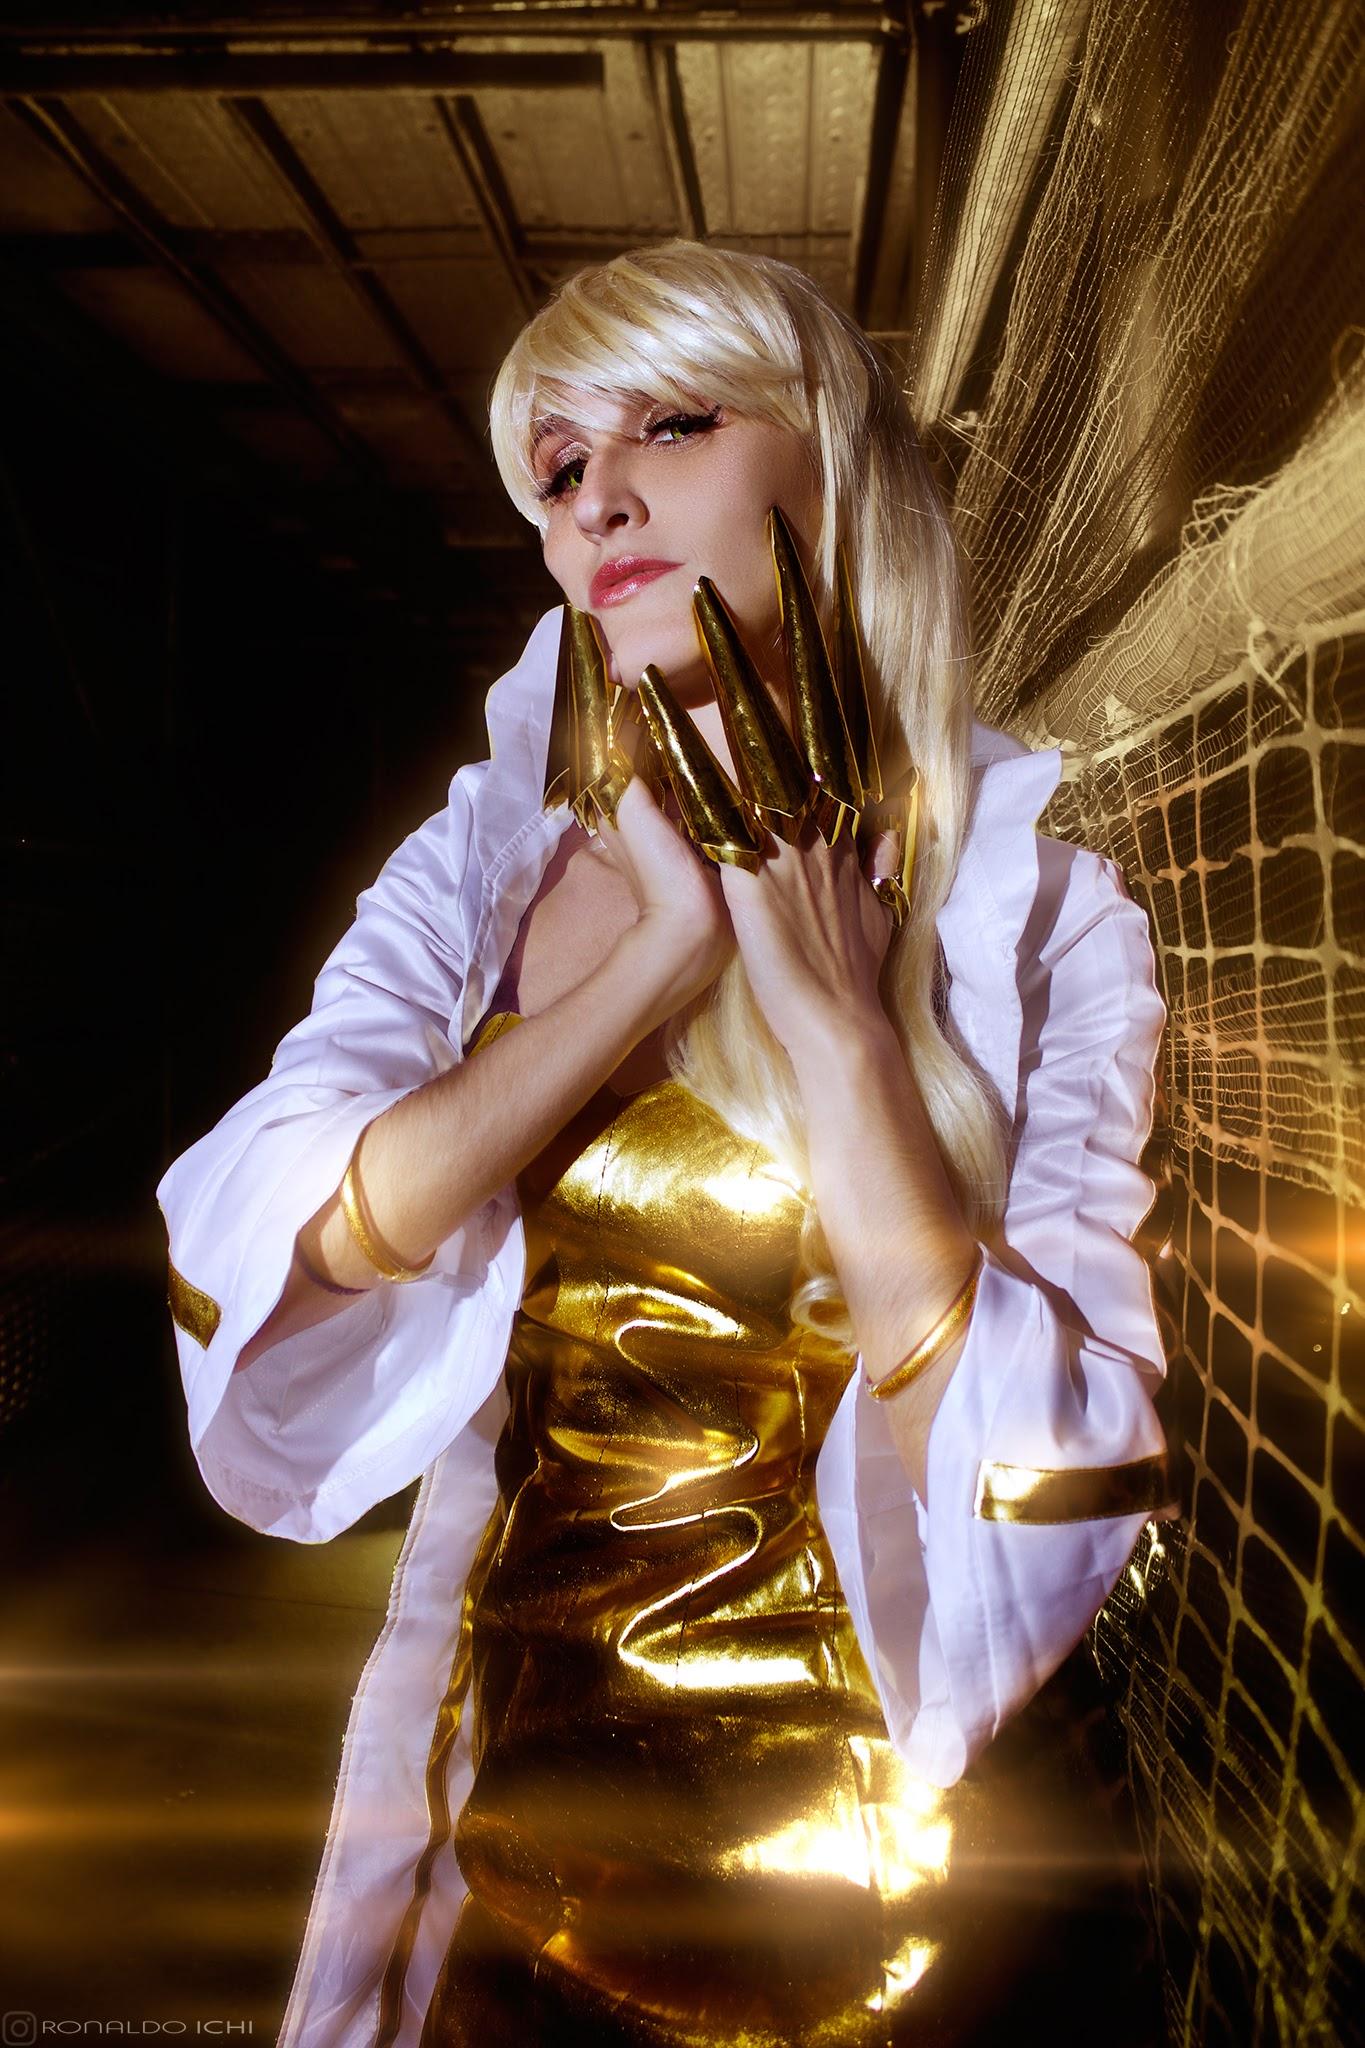 cosplay - Akali & Evelynn, KDA Prestige Edition - cosplayers Rach and Rizzy - photography by Ronaldo Ichi